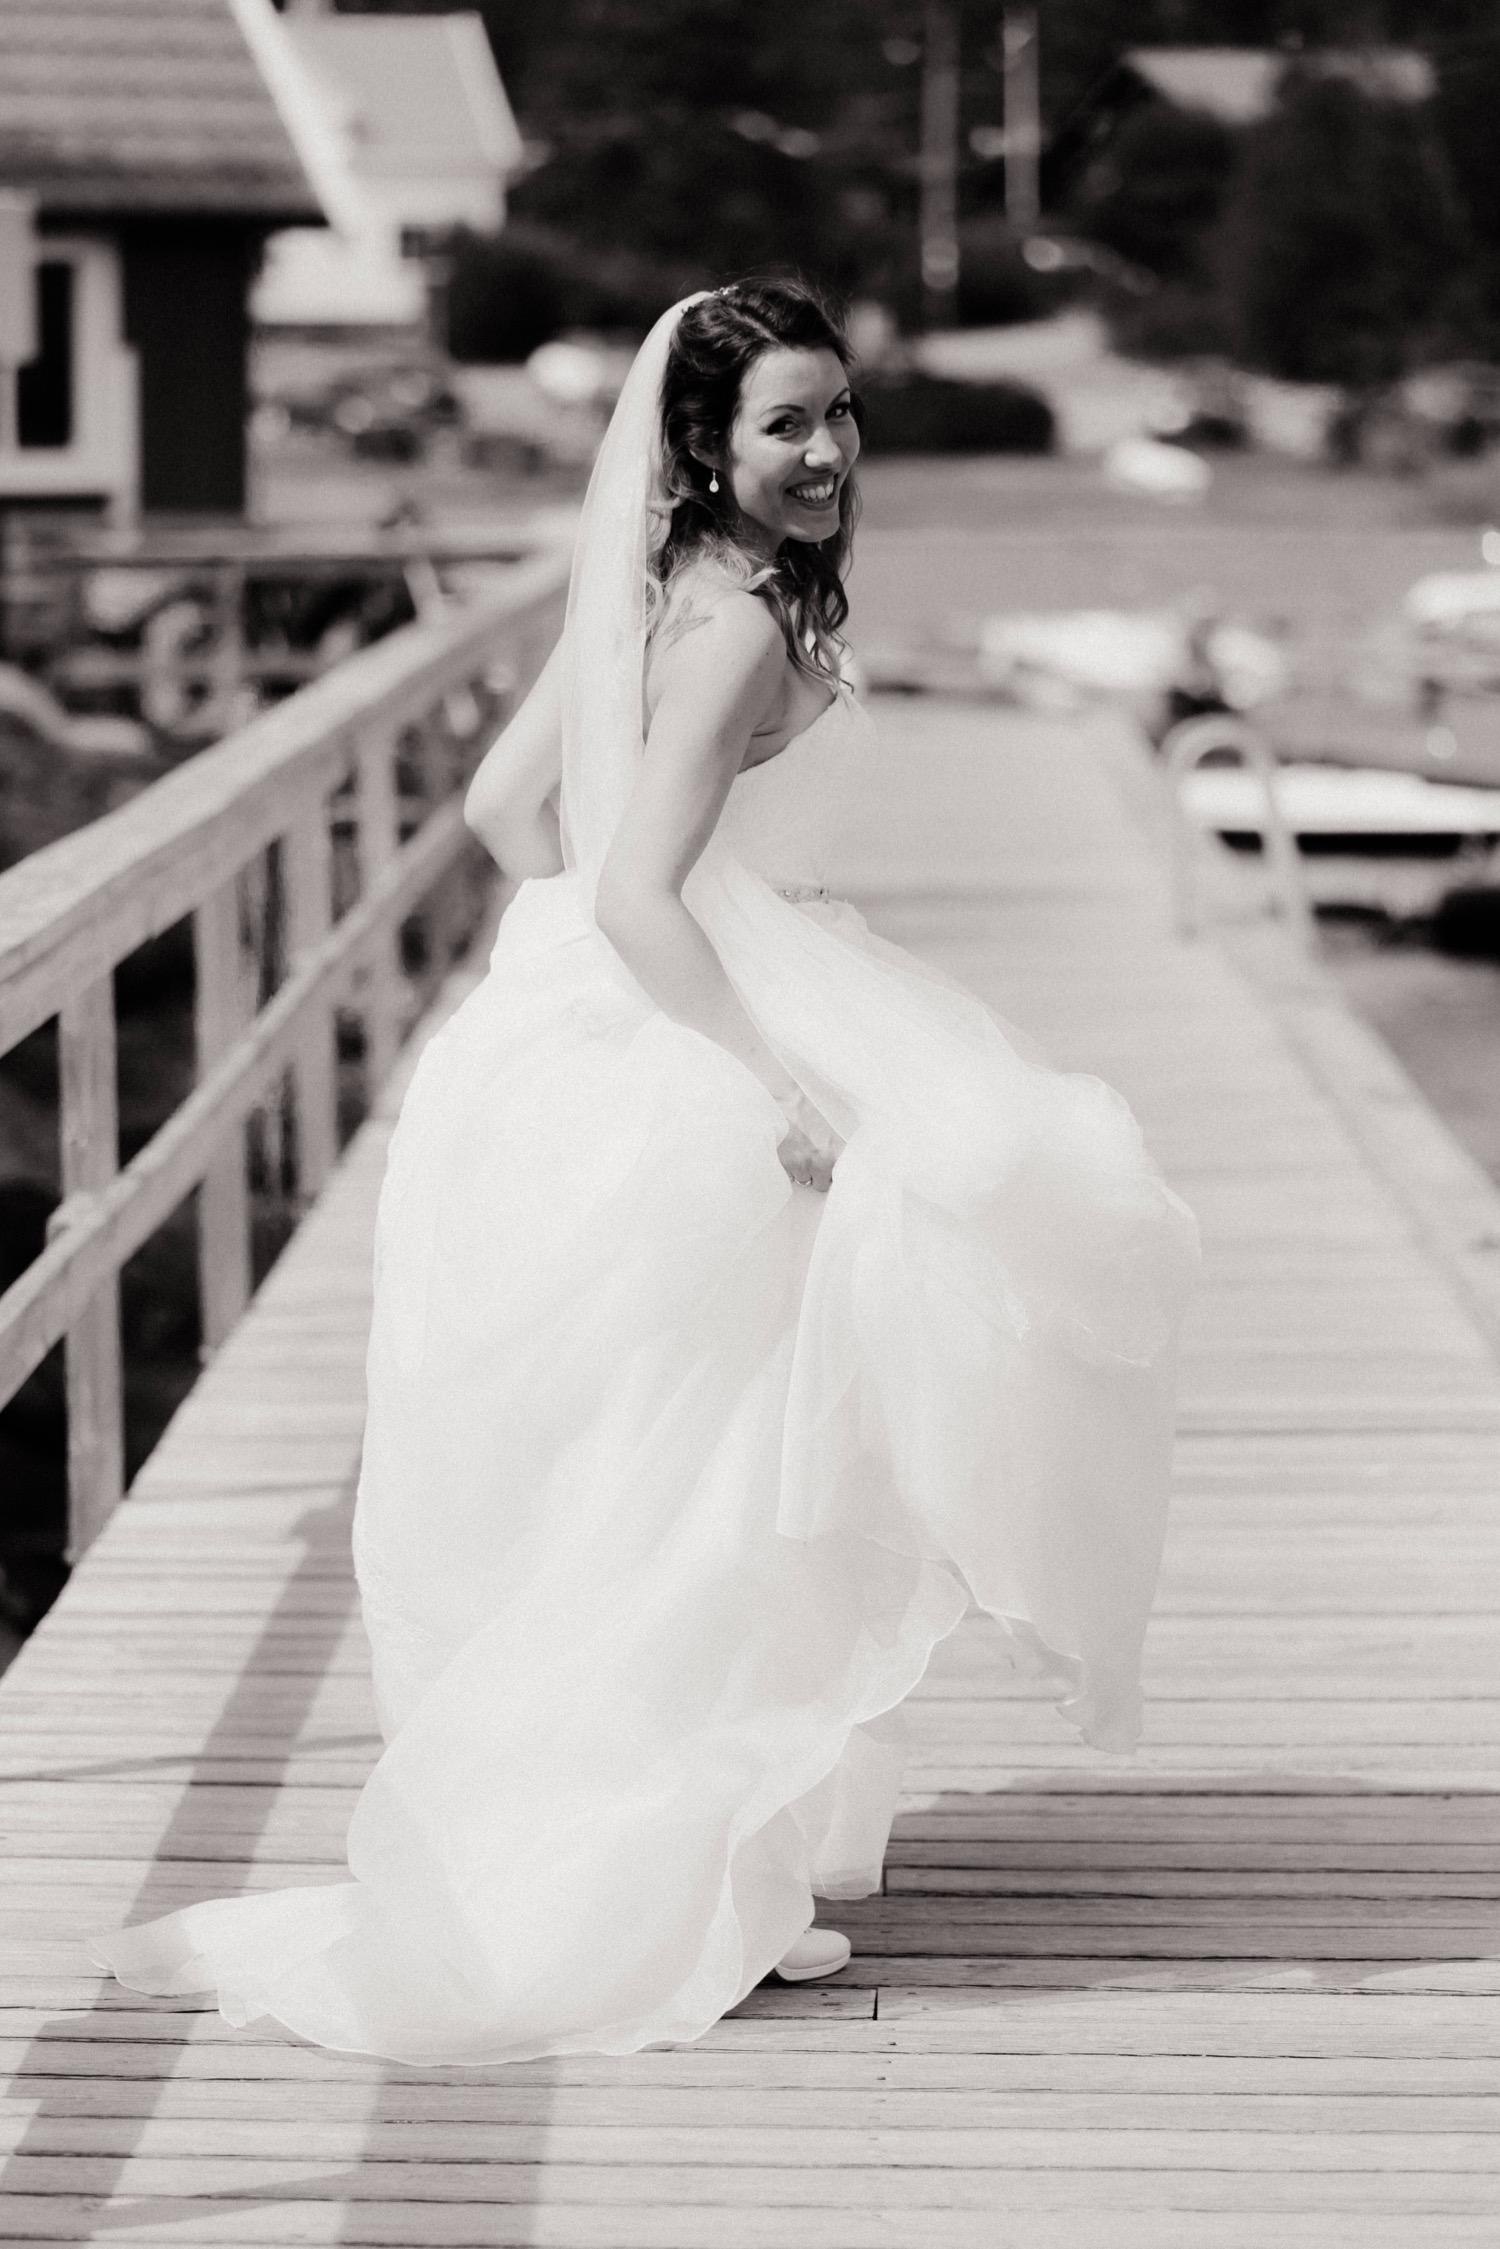 070_weddingphotographer_Bryllupsfotografering_Bryllupsbilder_fatmonkeyfoto_Bryllupsfotograf.jpg